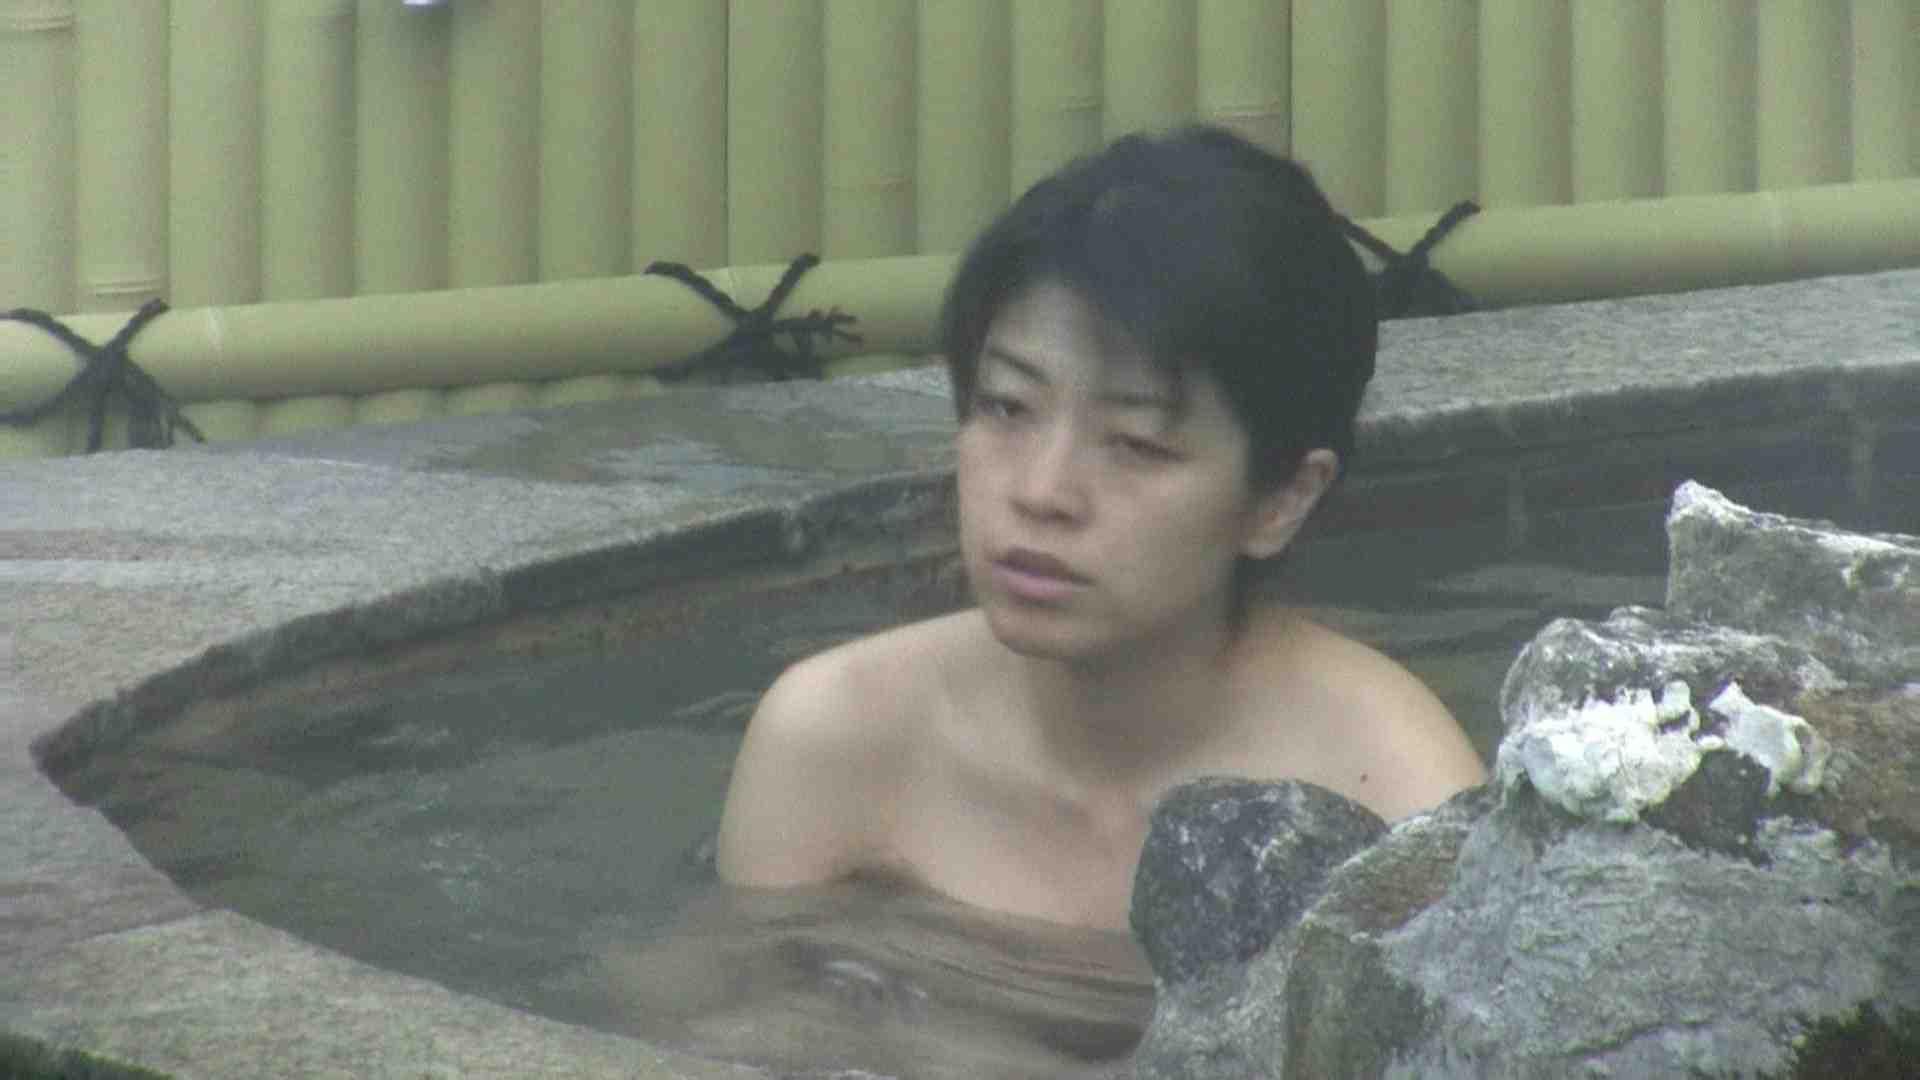 Aquaな露天風呂Vol.585 HなOL | 盗撮  93pic 5